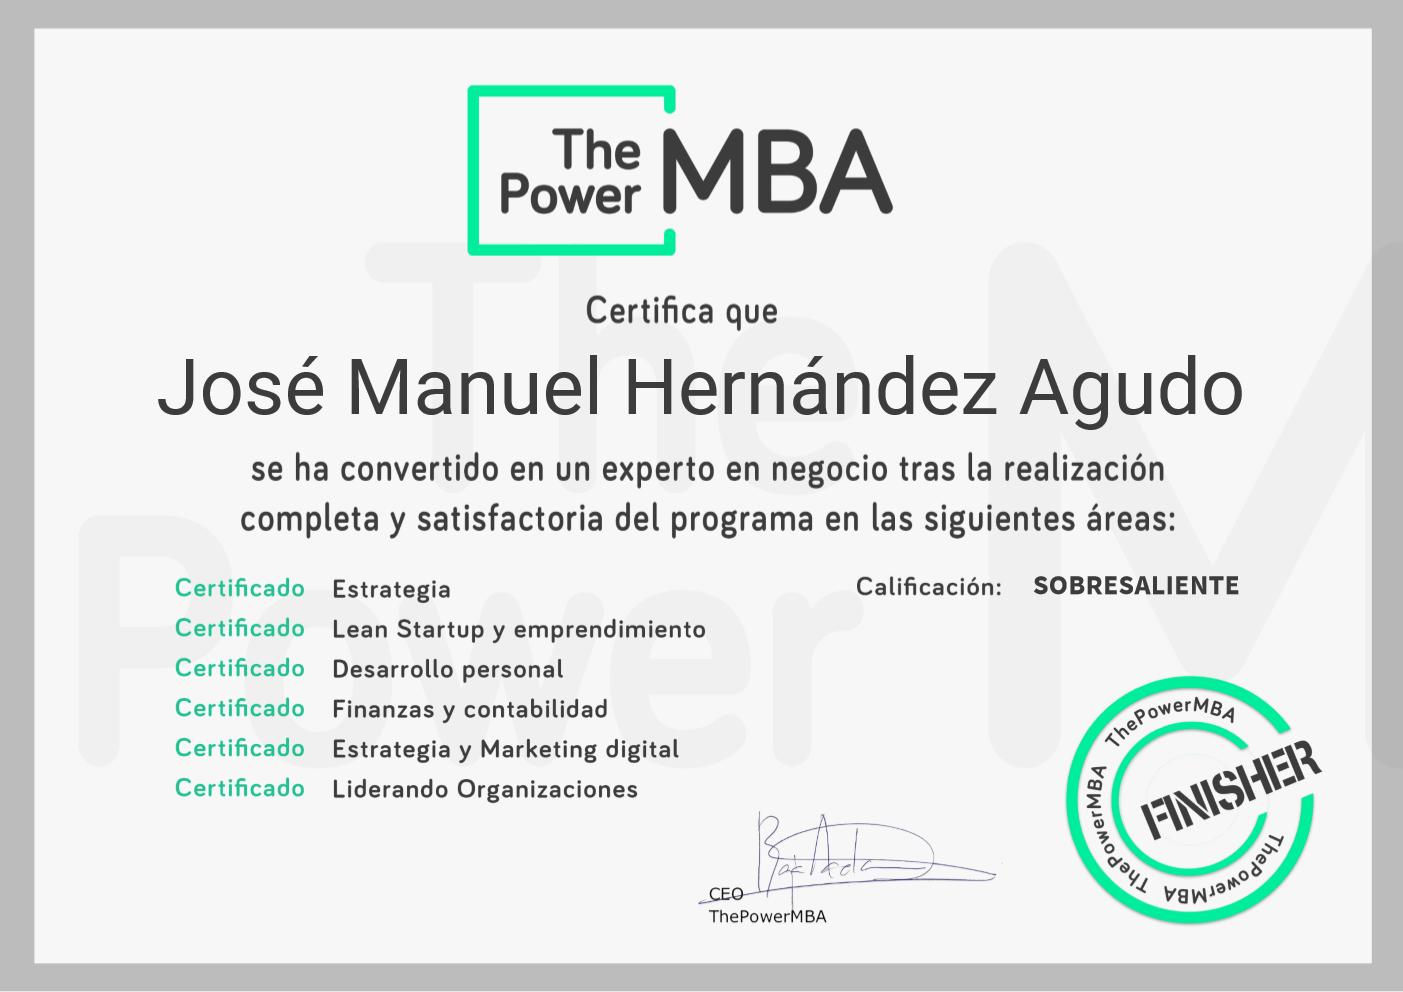 2019 ThePowerMBA